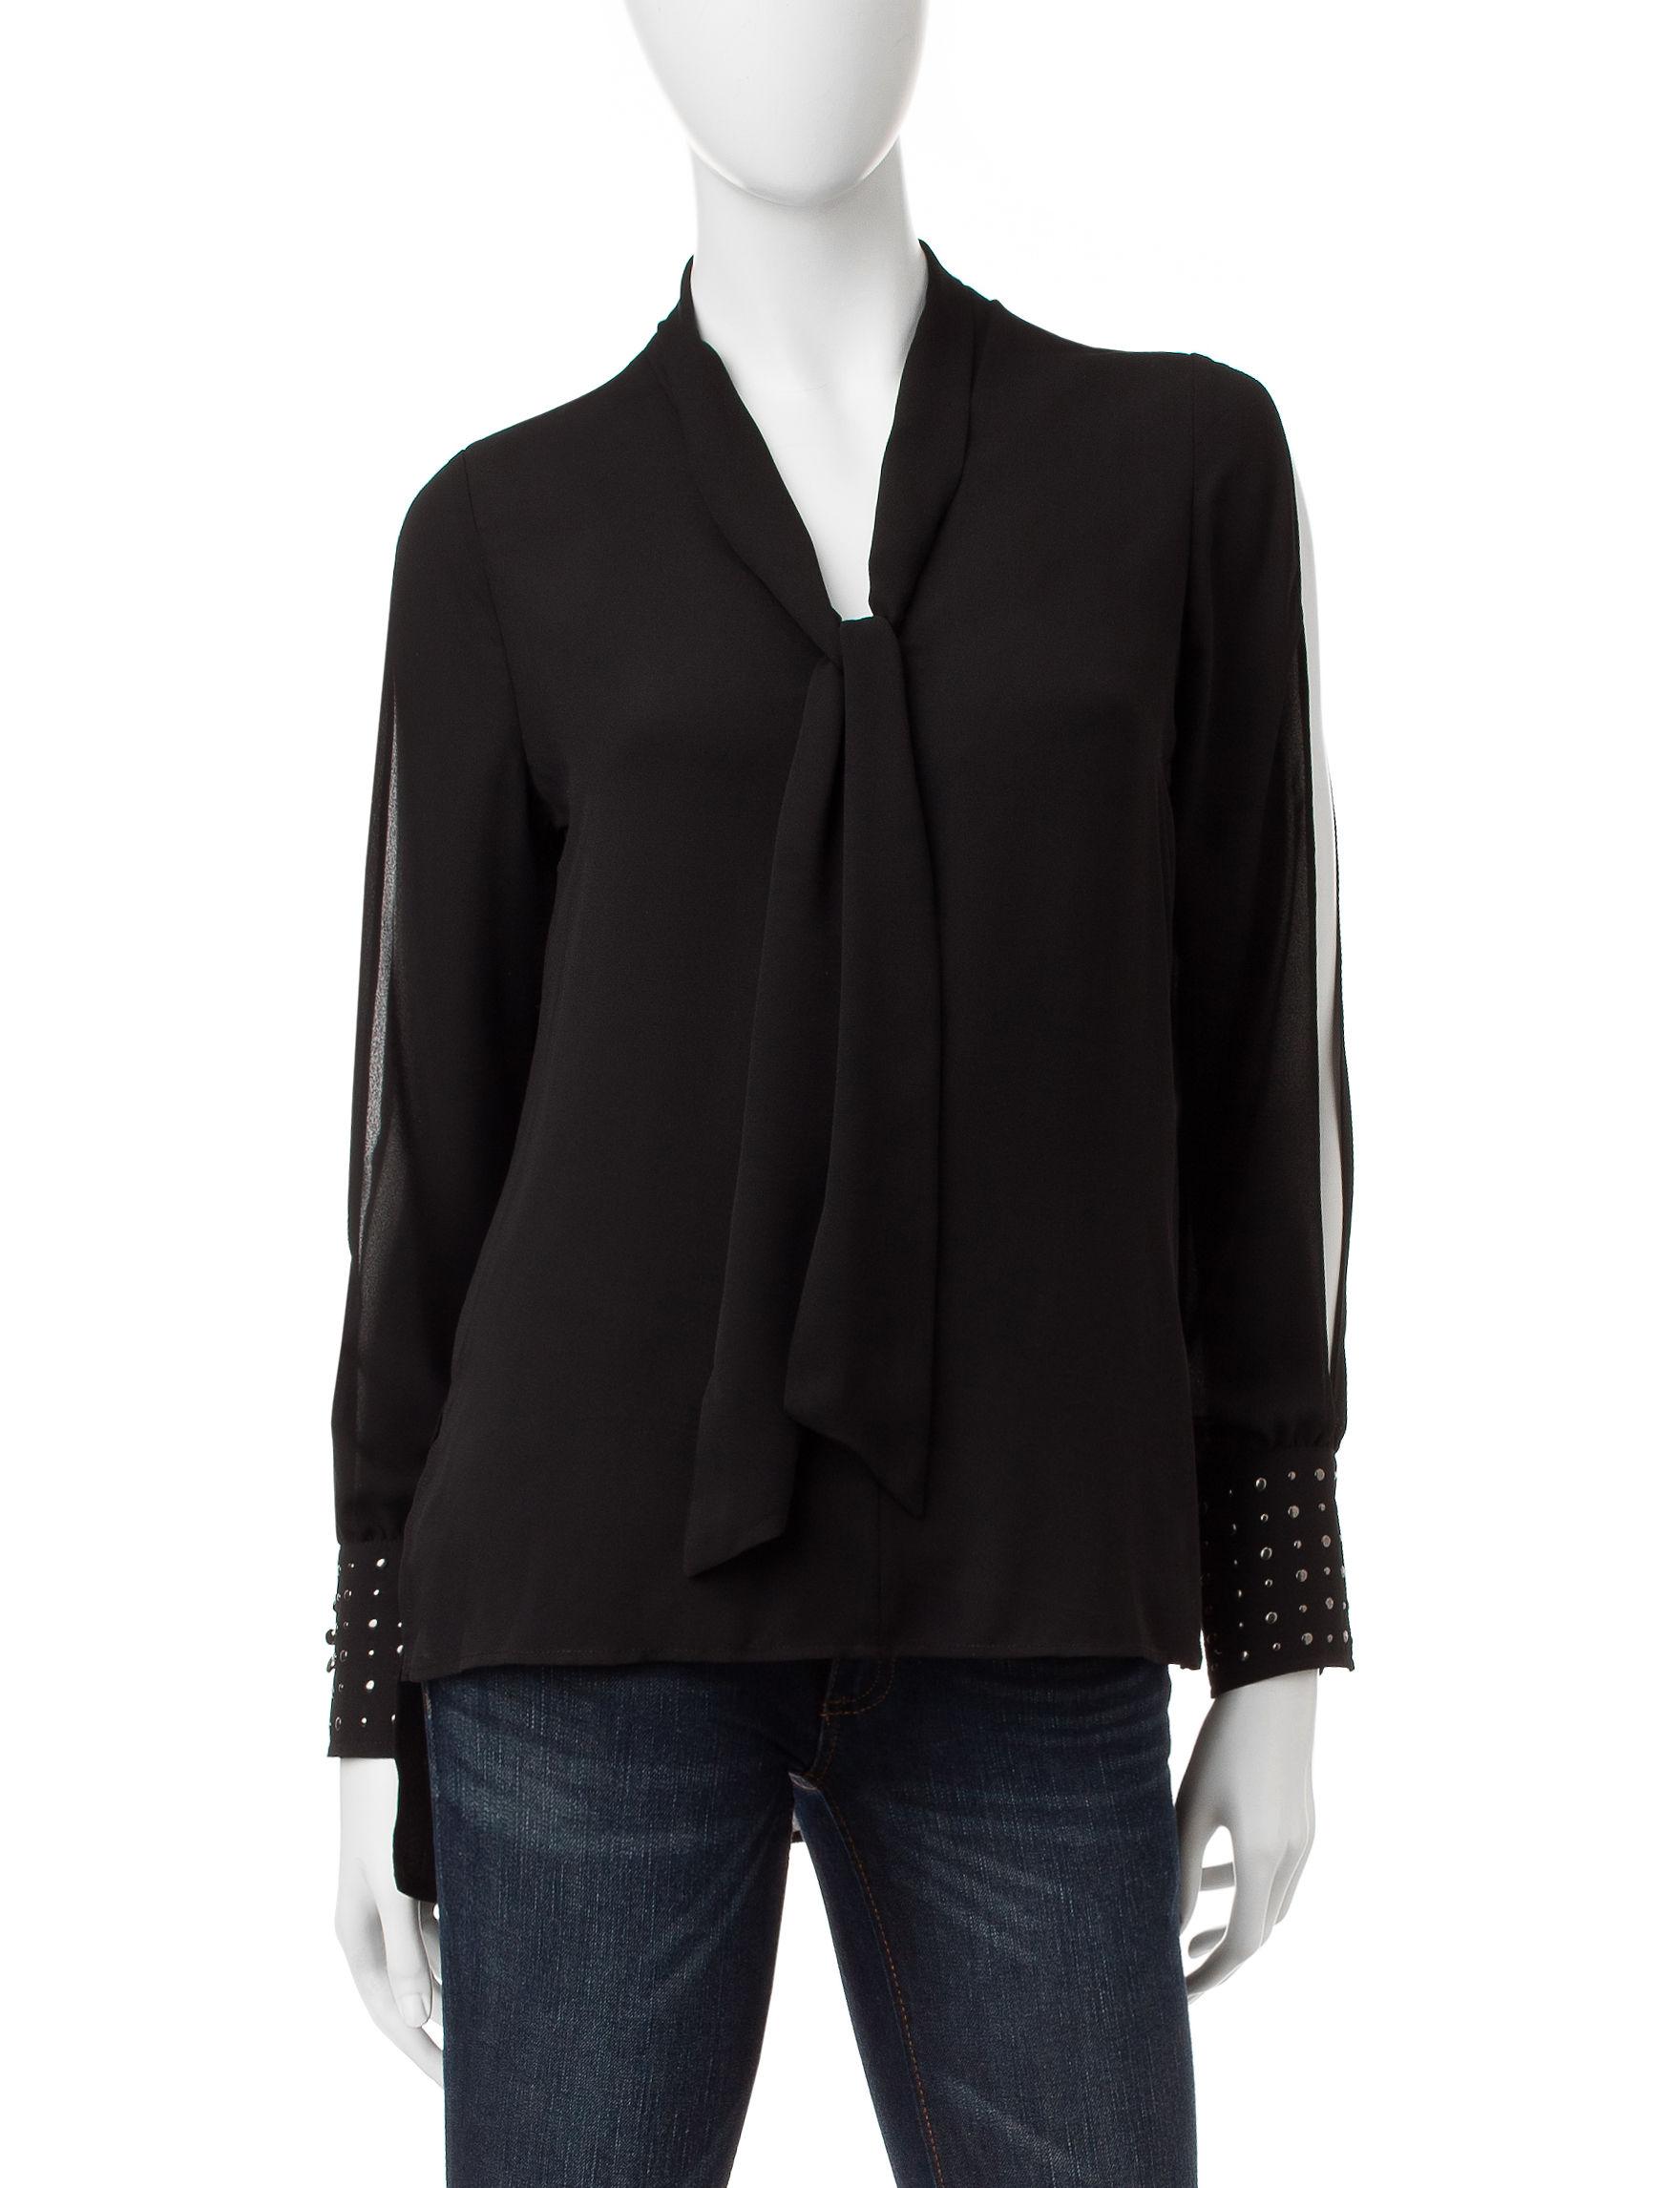 XOXO Black Shirts & Blouses